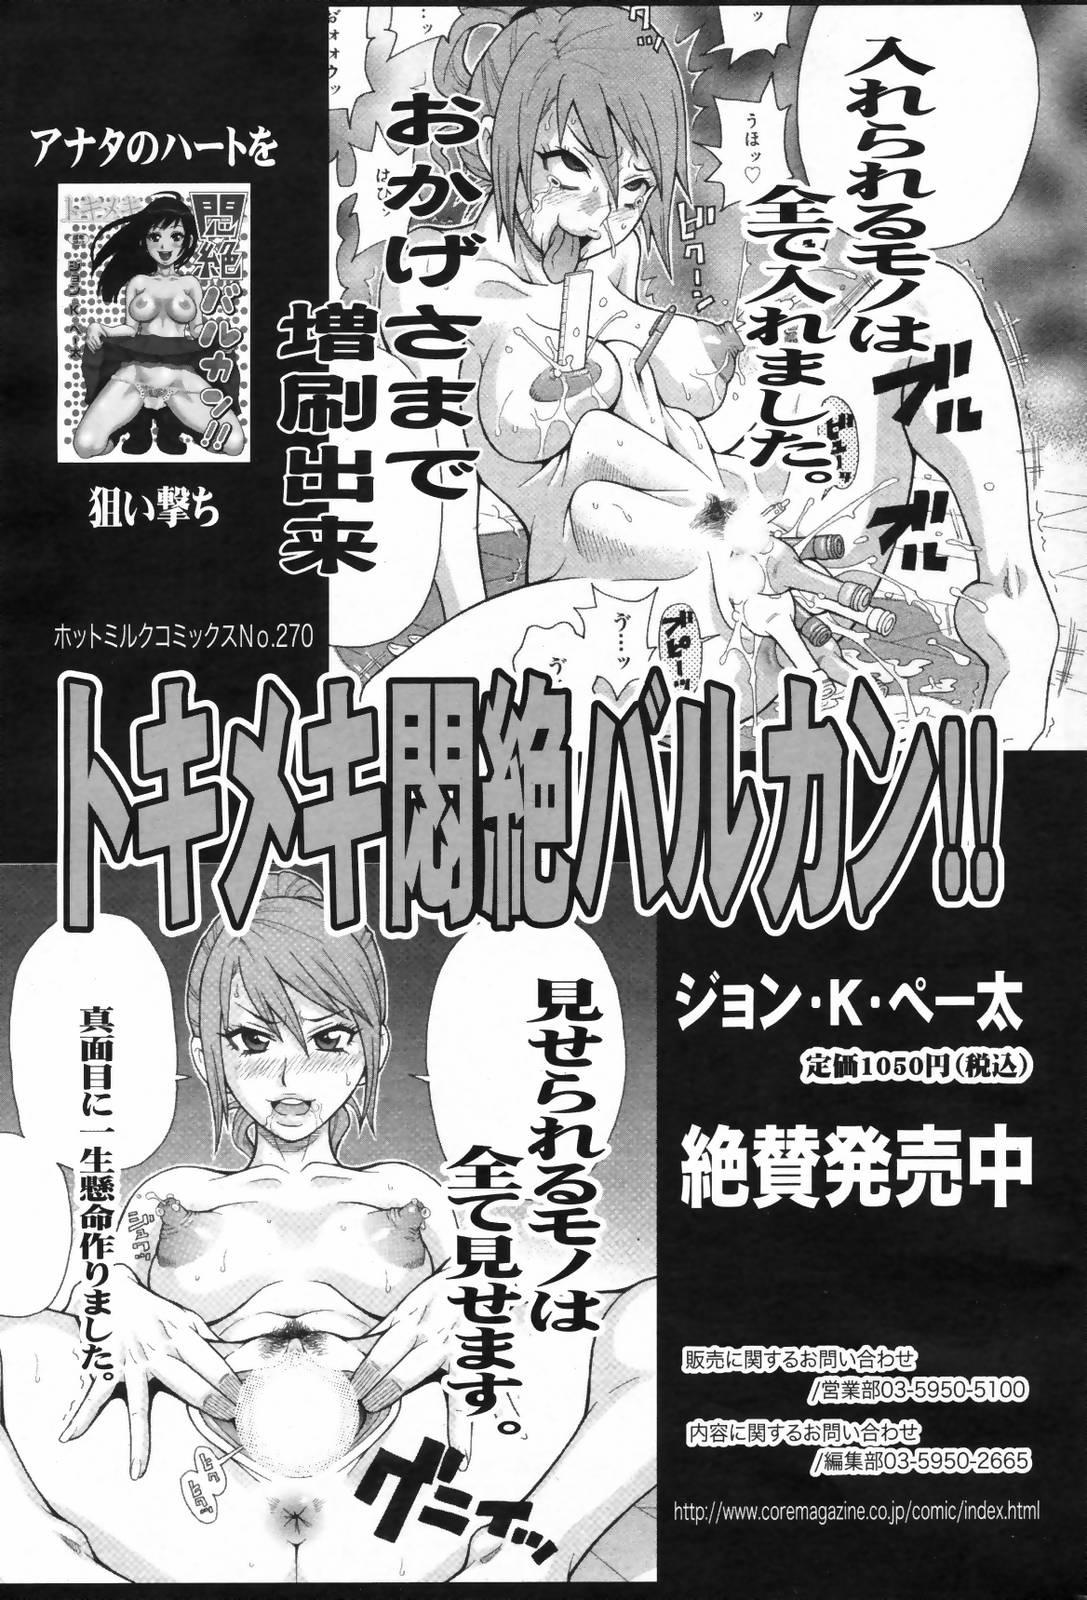 Manga Bangaichi 2009-02 Vol. 234 202